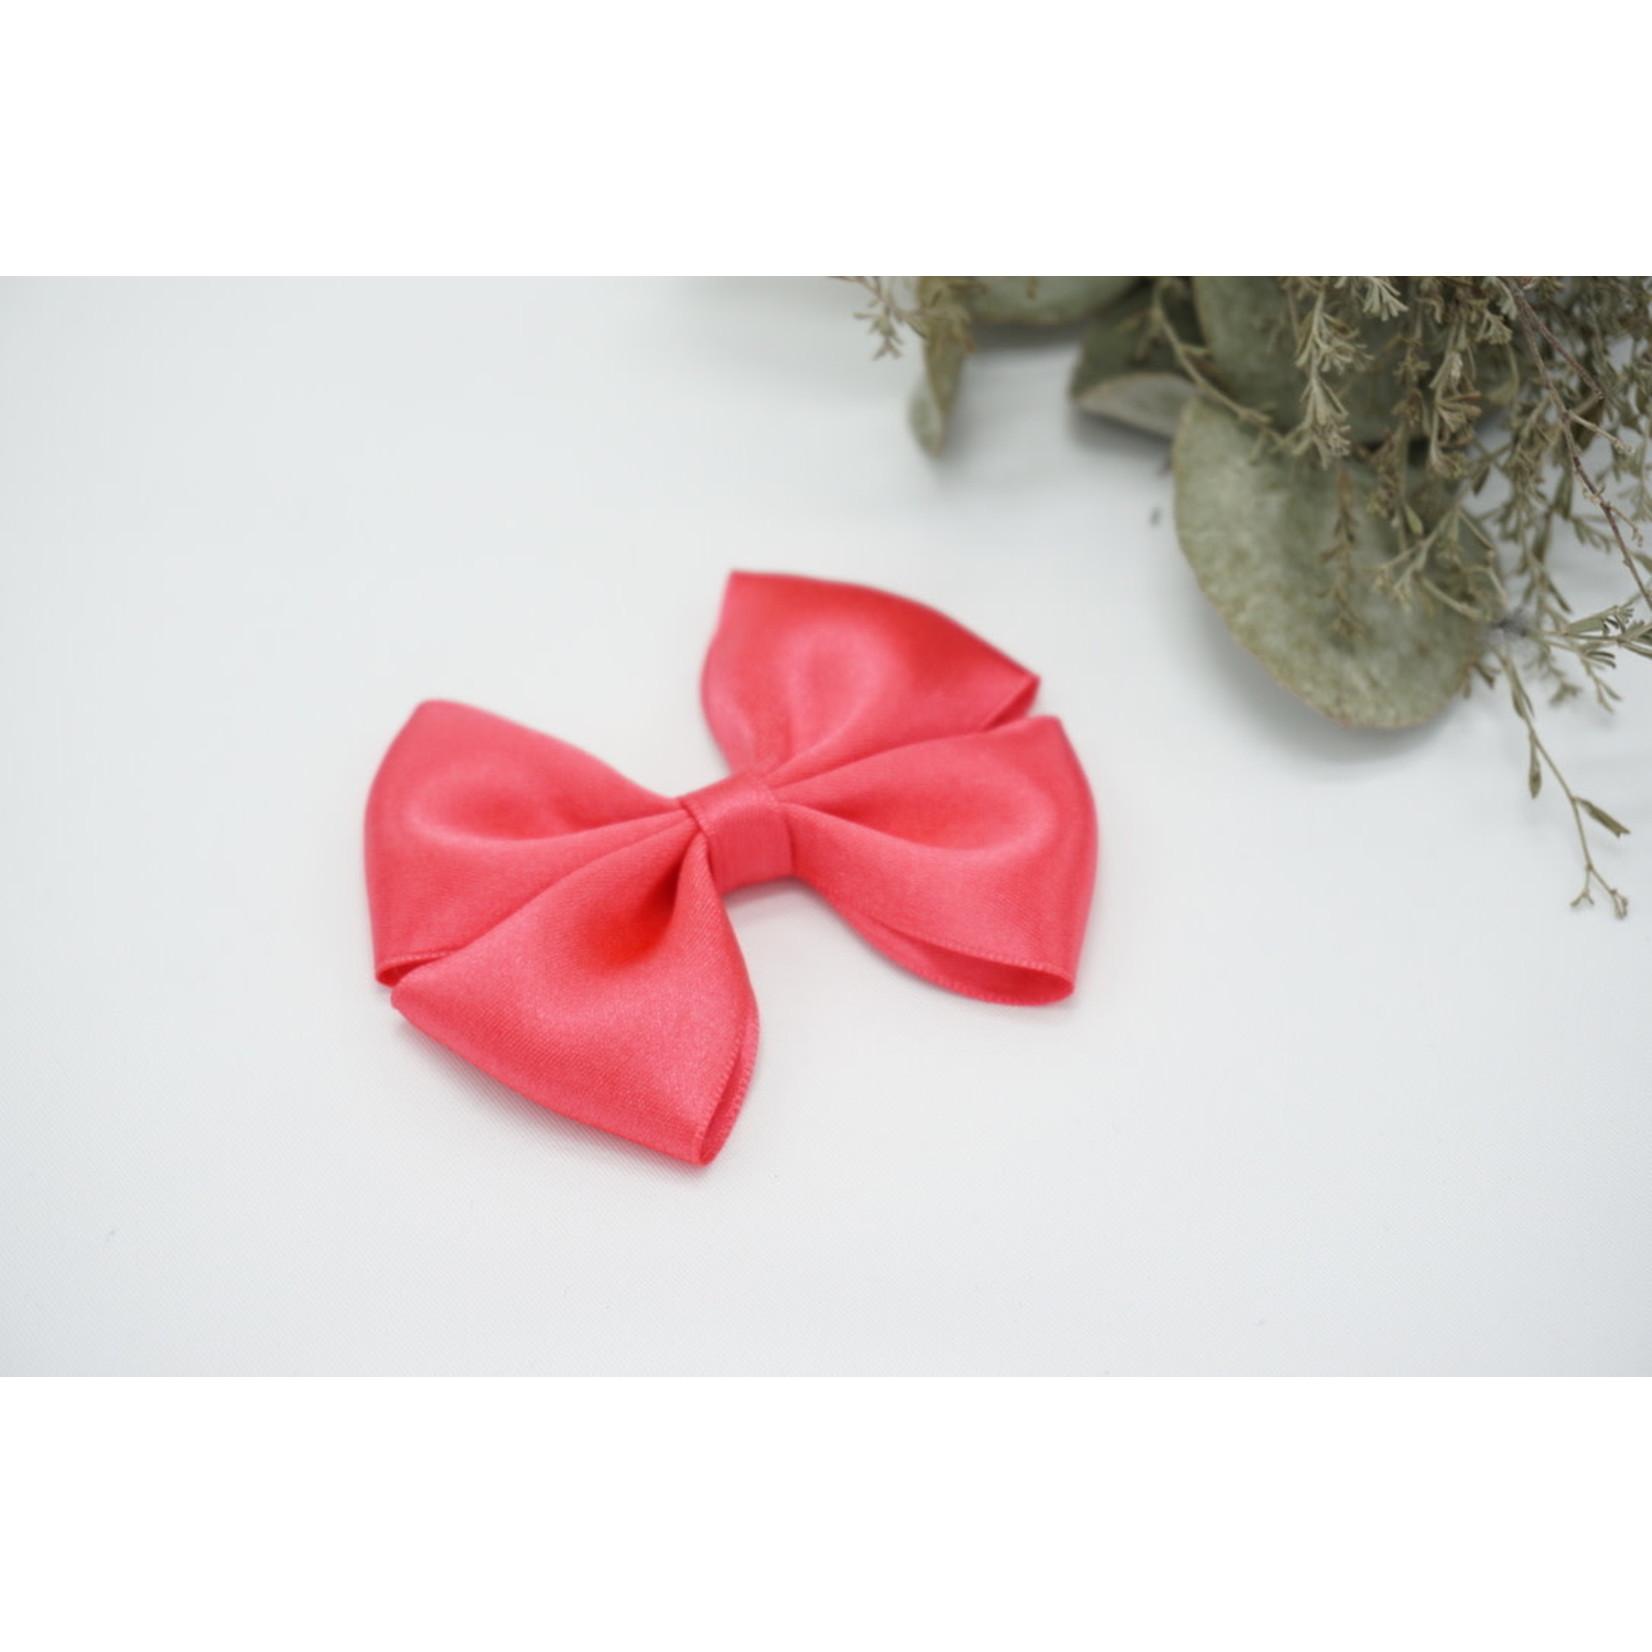 Petite Zara Satin Bow - Indian